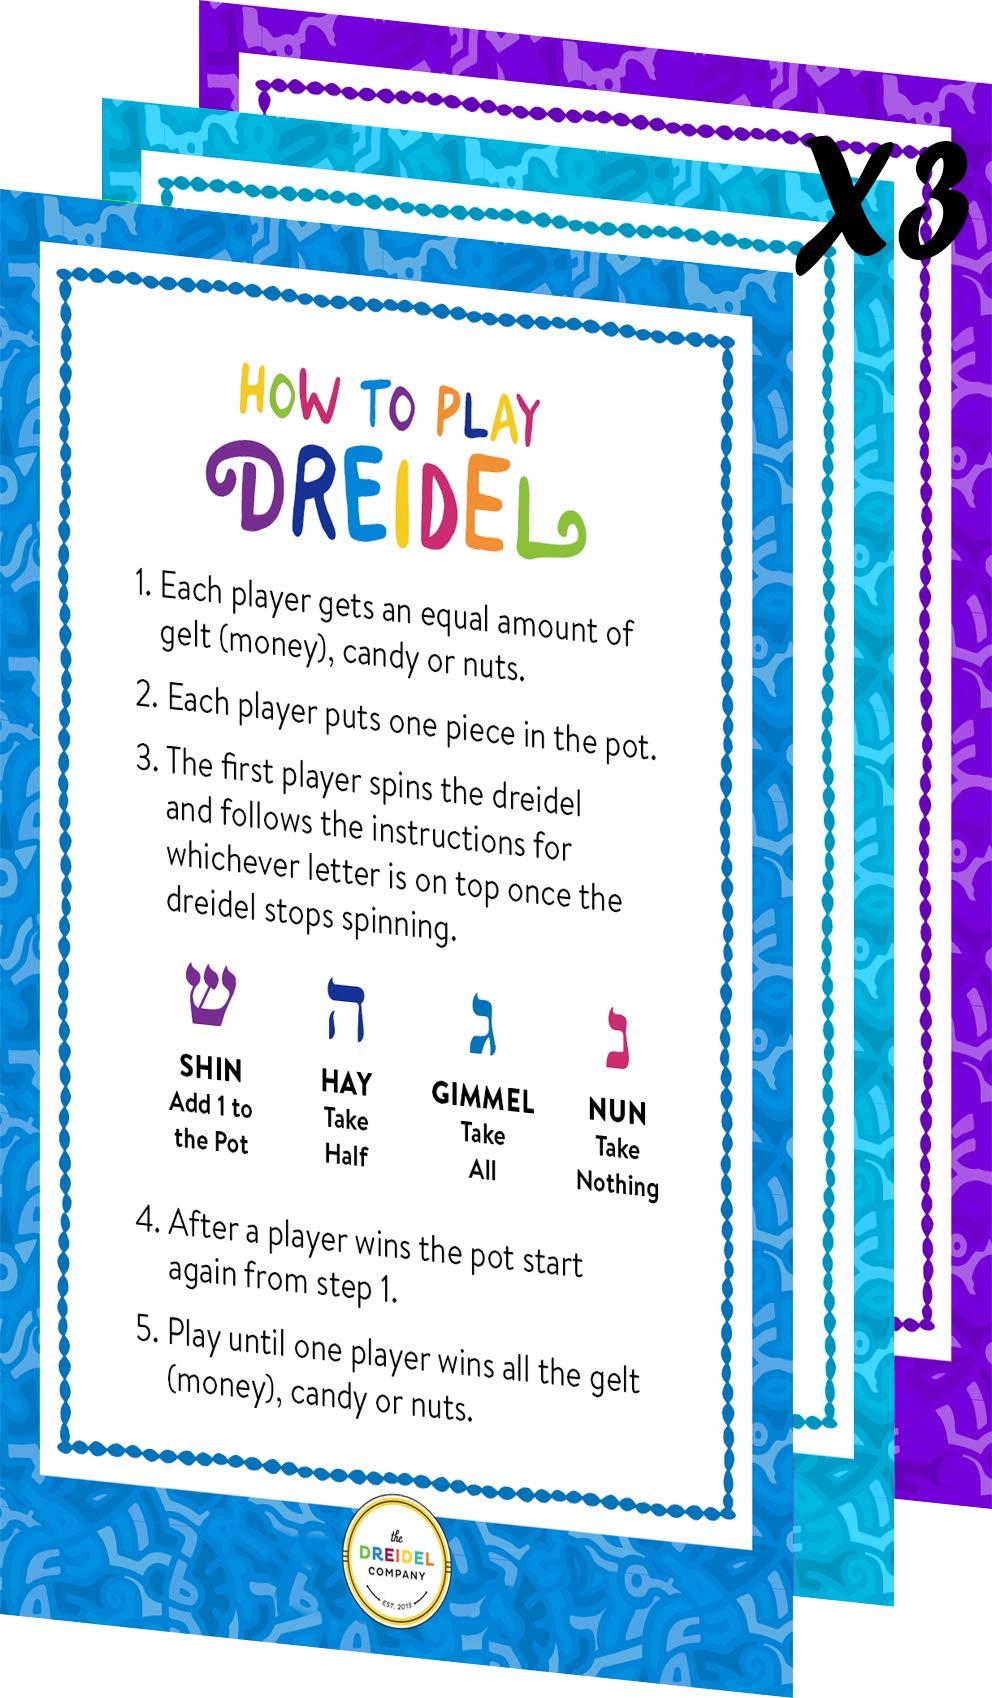 Hanukkah Dreidels Metallic Multi-Colored Draydels with English Translation - Includes 3 Dreidel Game Instruction Cards (30-Pack) by The Dreidel Company (Image #4)